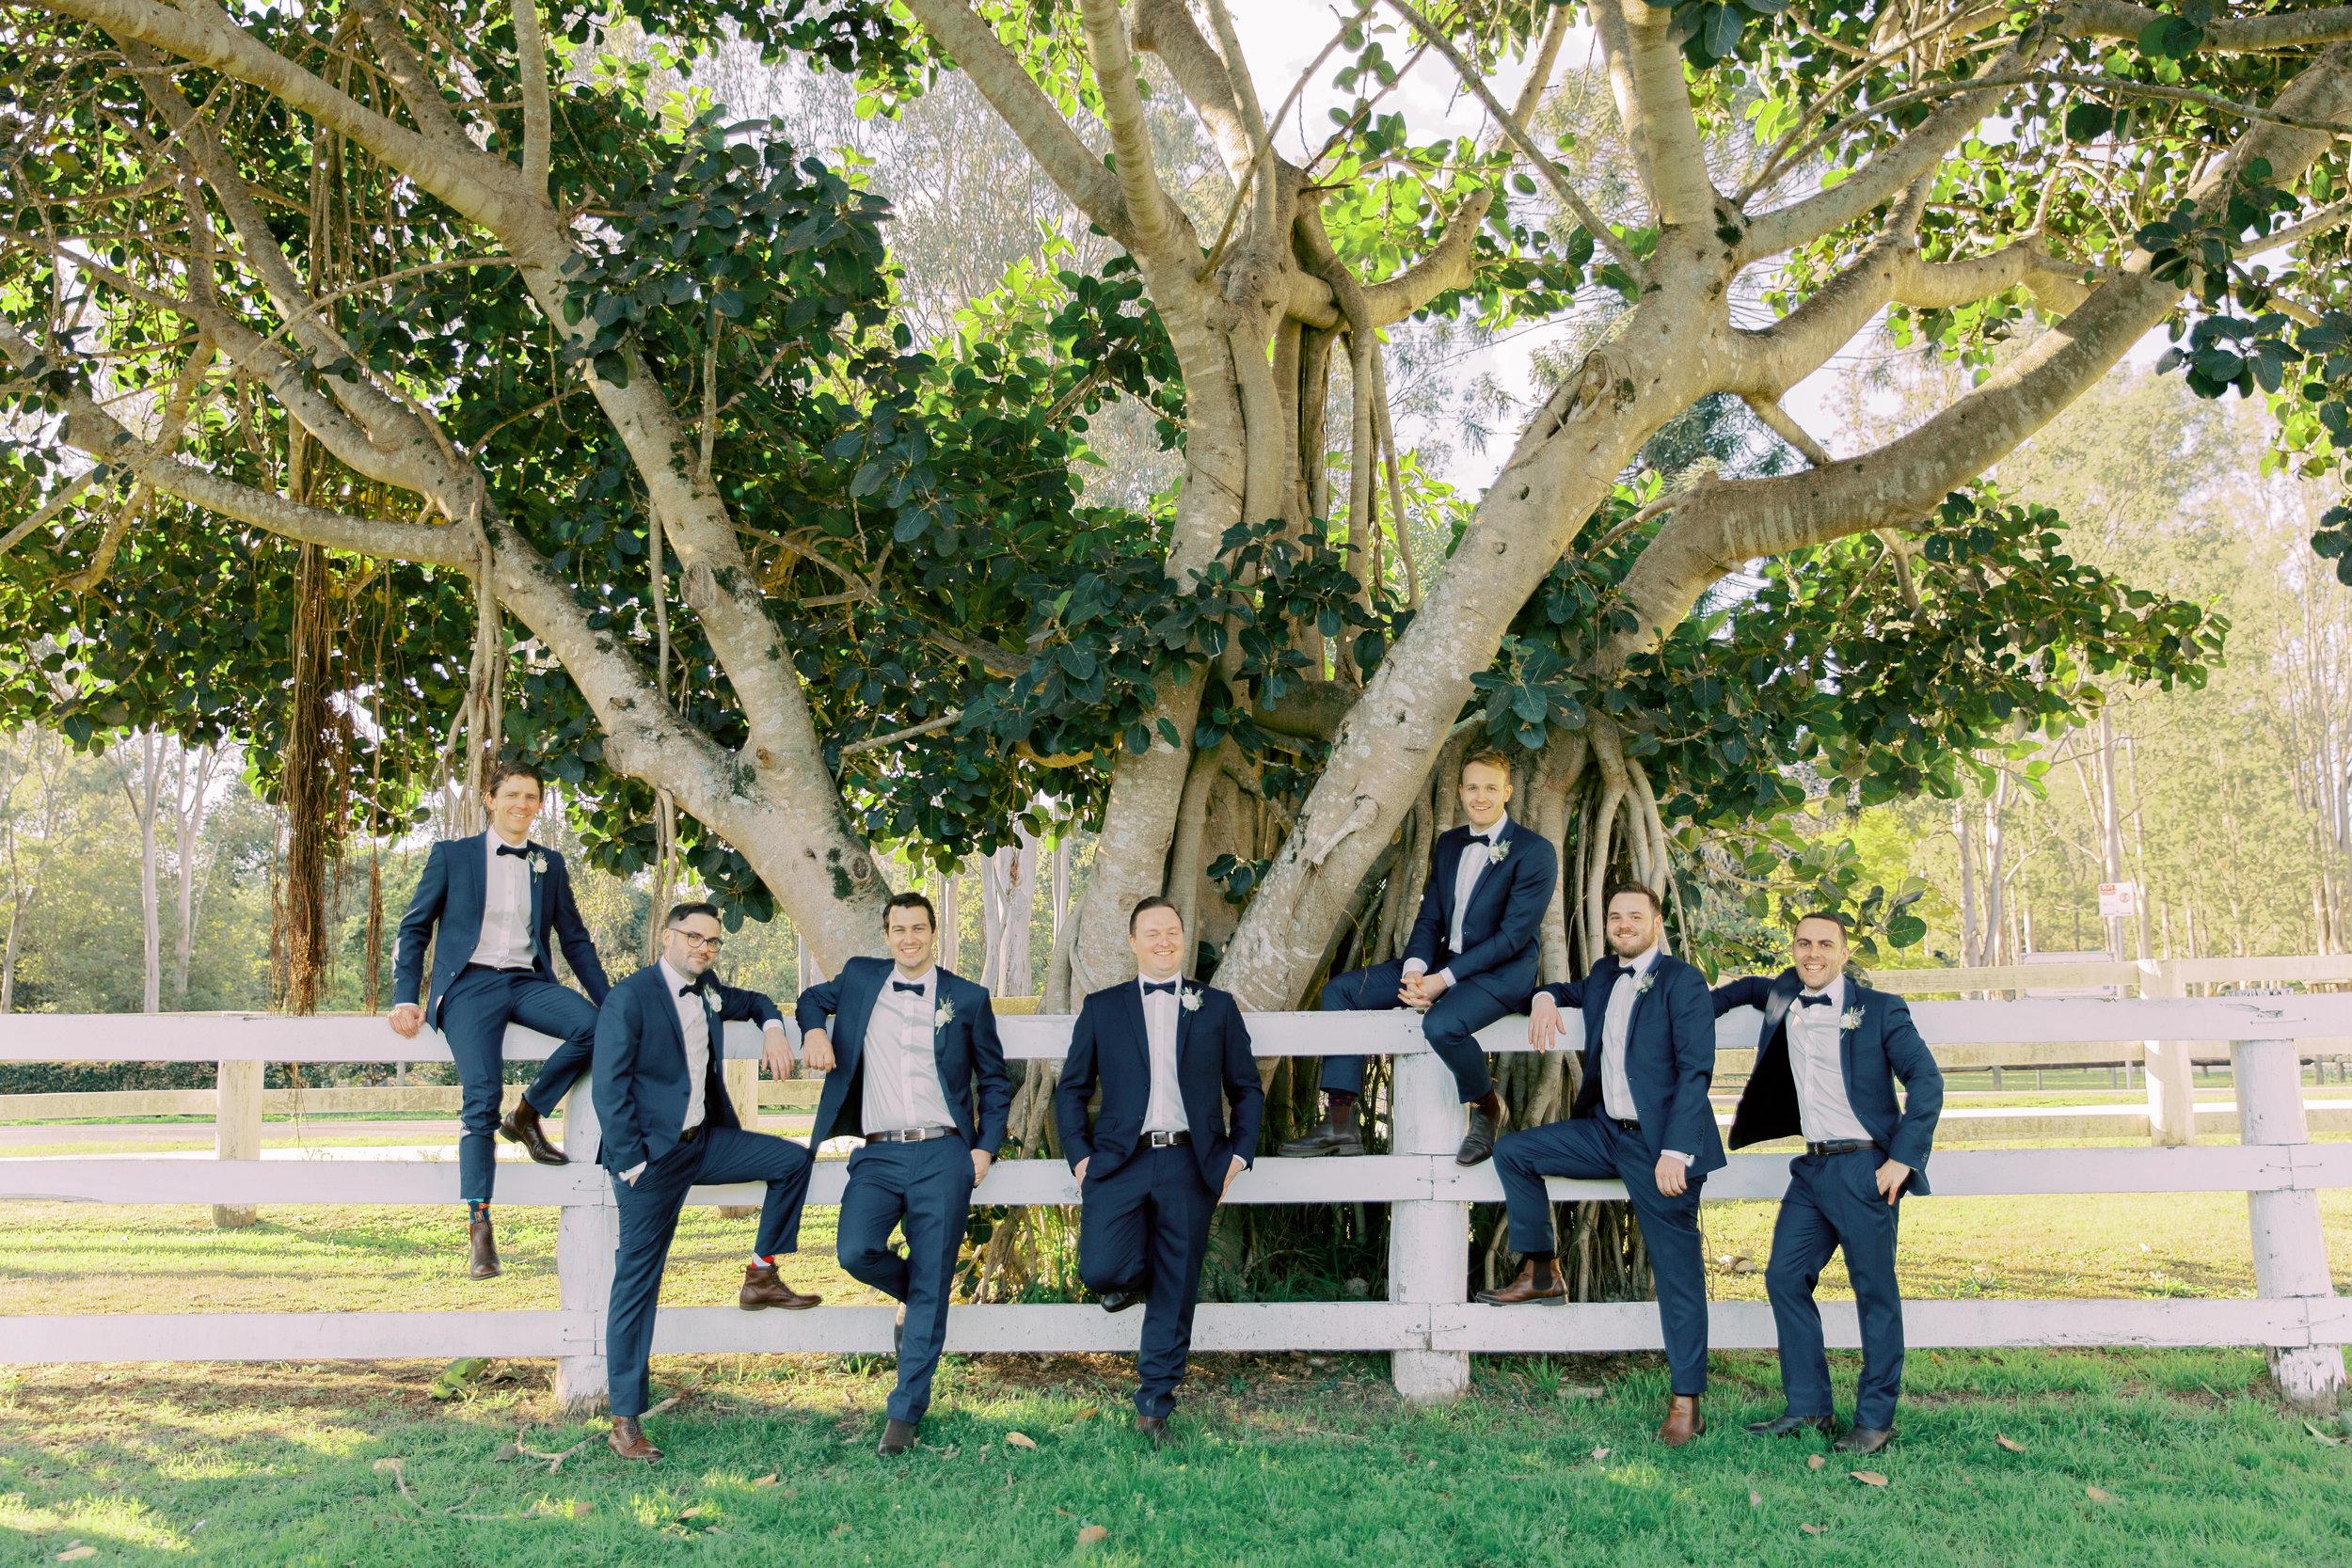 brisbane-gold-coast-sunshine-coast-tweed-romantic-fine-art-wedding-photography-lauren-olivia-38.jpg